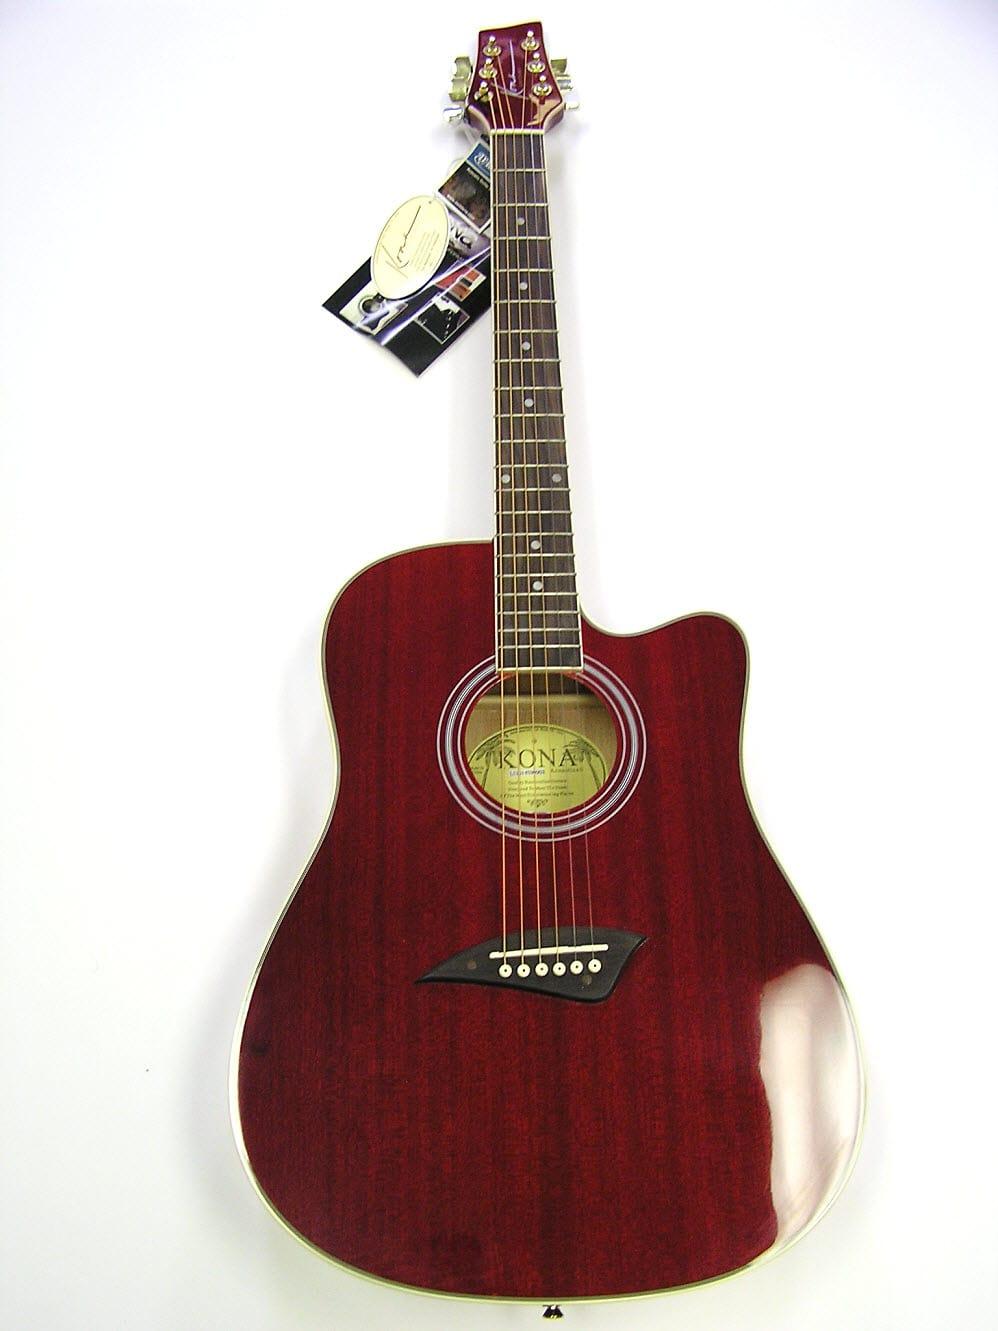 kona k1 series acoustic guitar trans red gloss finish reverb. Black Bedroom Furniture Sets. Home Design Ideas